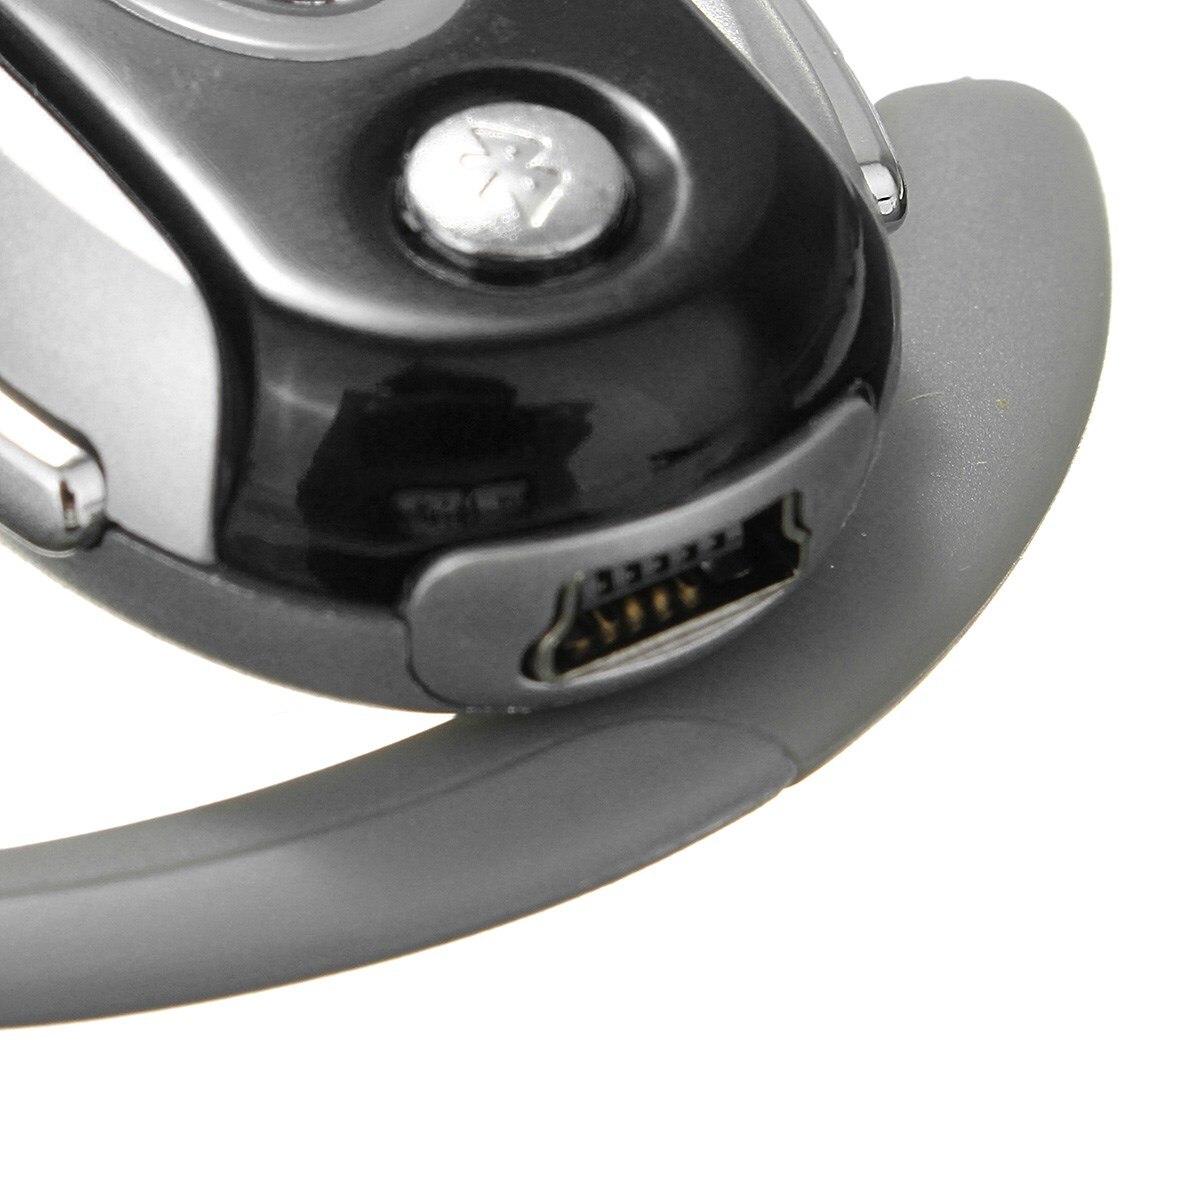 Mini LED de Conducción Segura Auriculares de Música Inalámbrica Bluetooth 2.1 Au